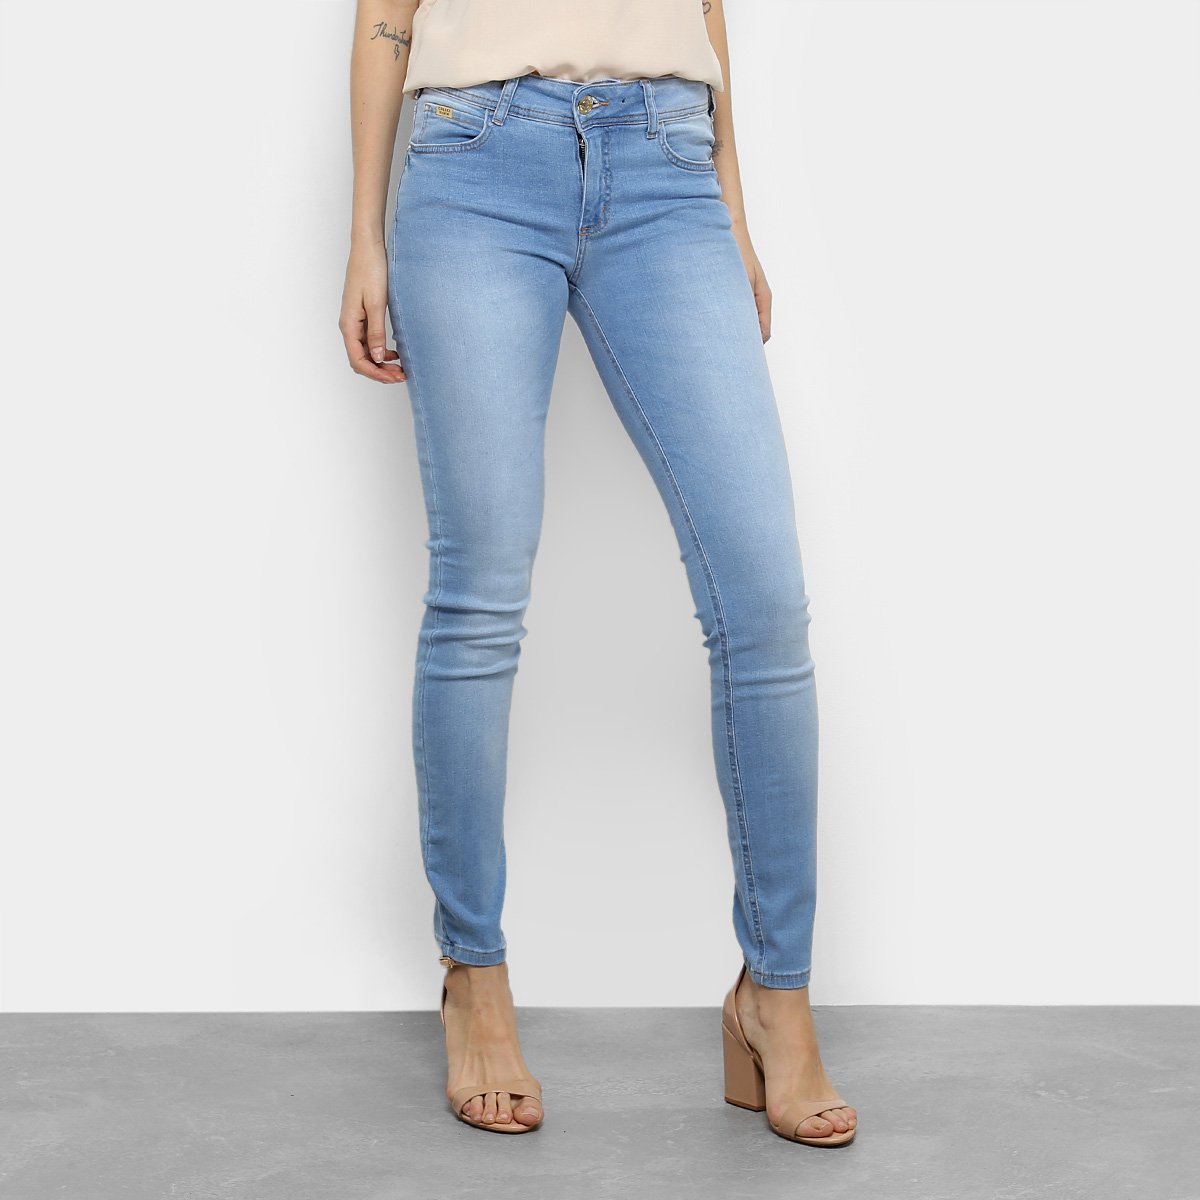 034092892 Calça Jeans Skinny Colcci Fátima Cintura Média Feminina - Azul   Netshoes